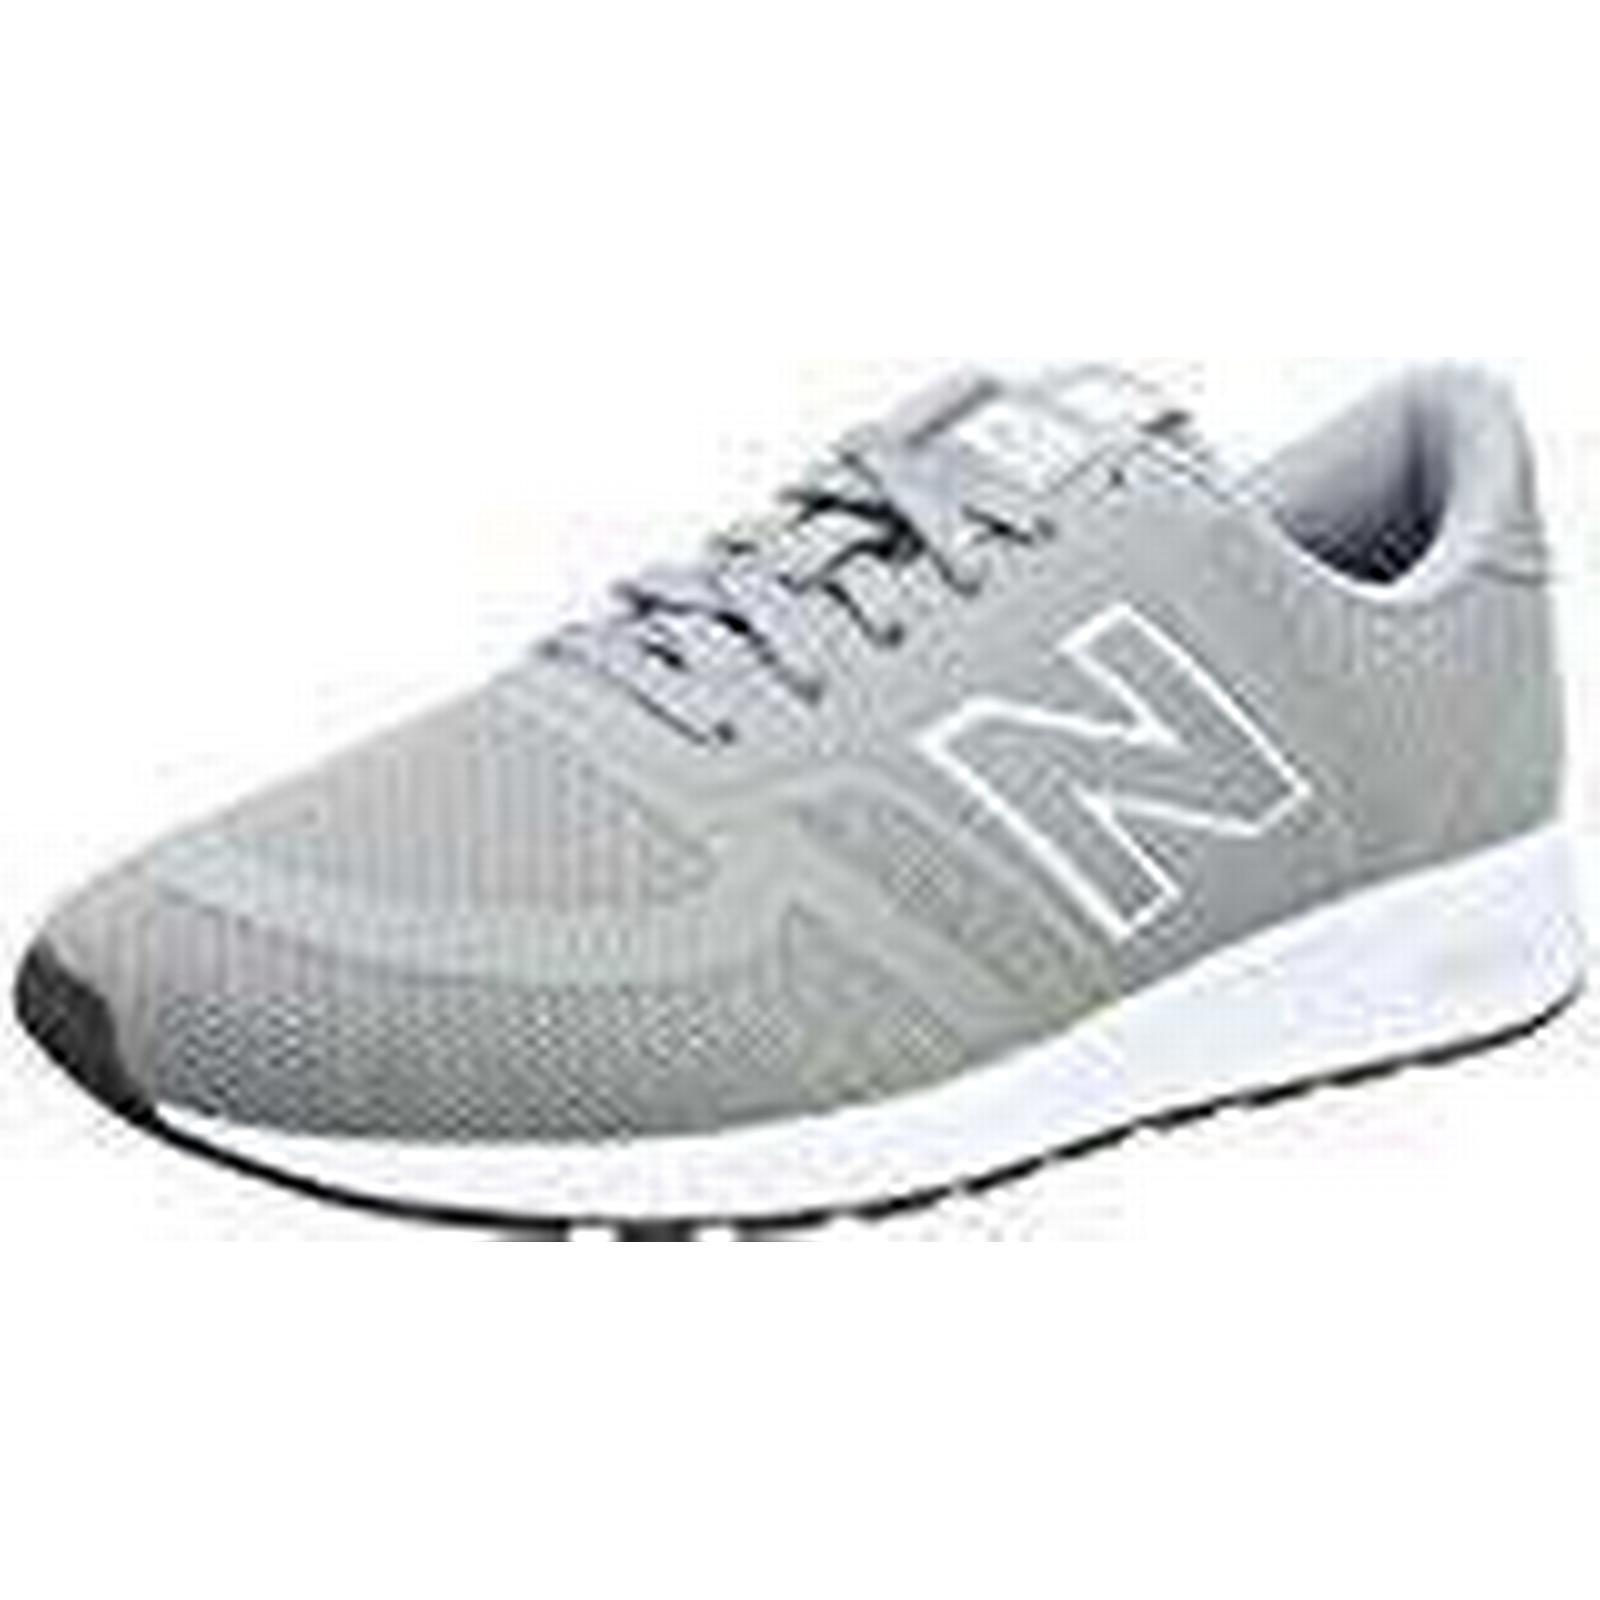 New (Grey), Balance Men's MRL420V1 Trainers, (Grey), New 6.5 UK 40 EU 25af52